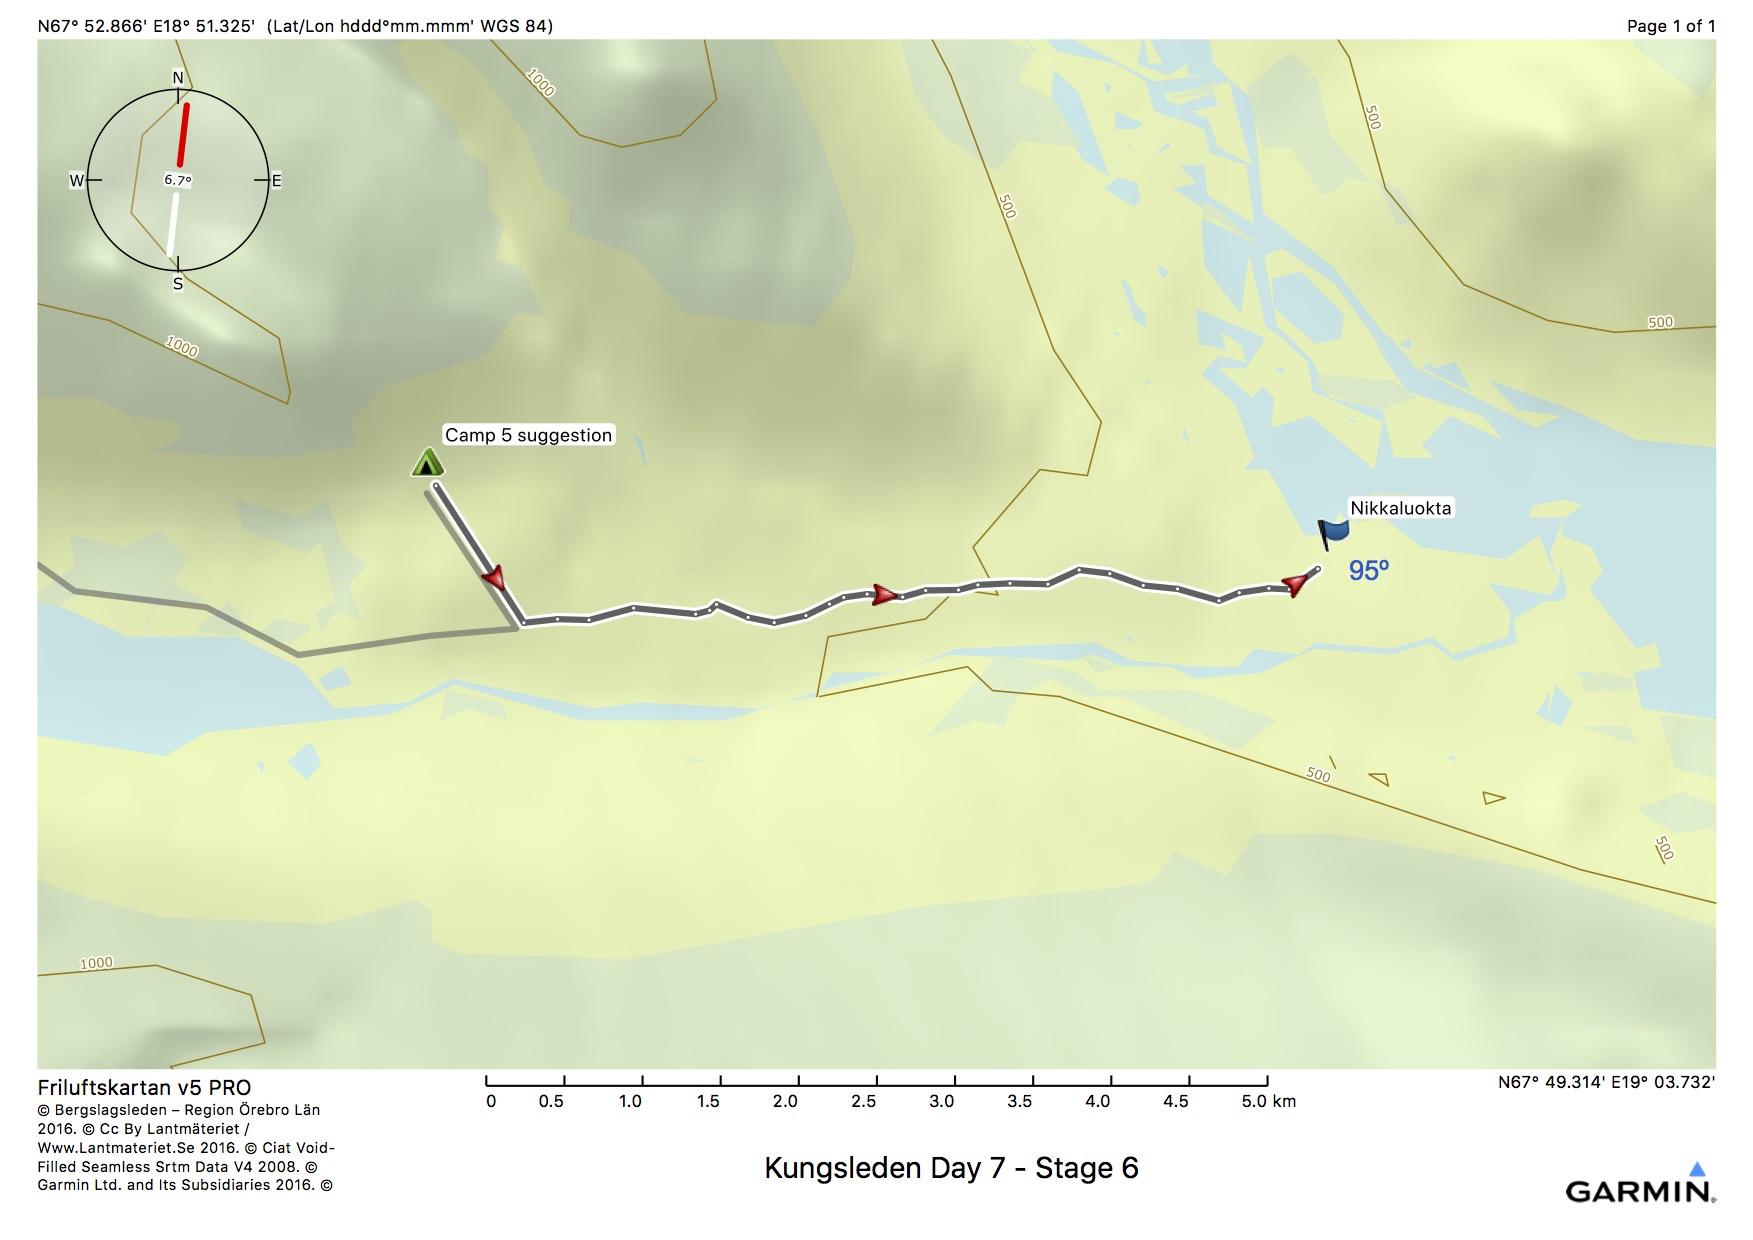 Kungsleden Day 7 - Stage 6